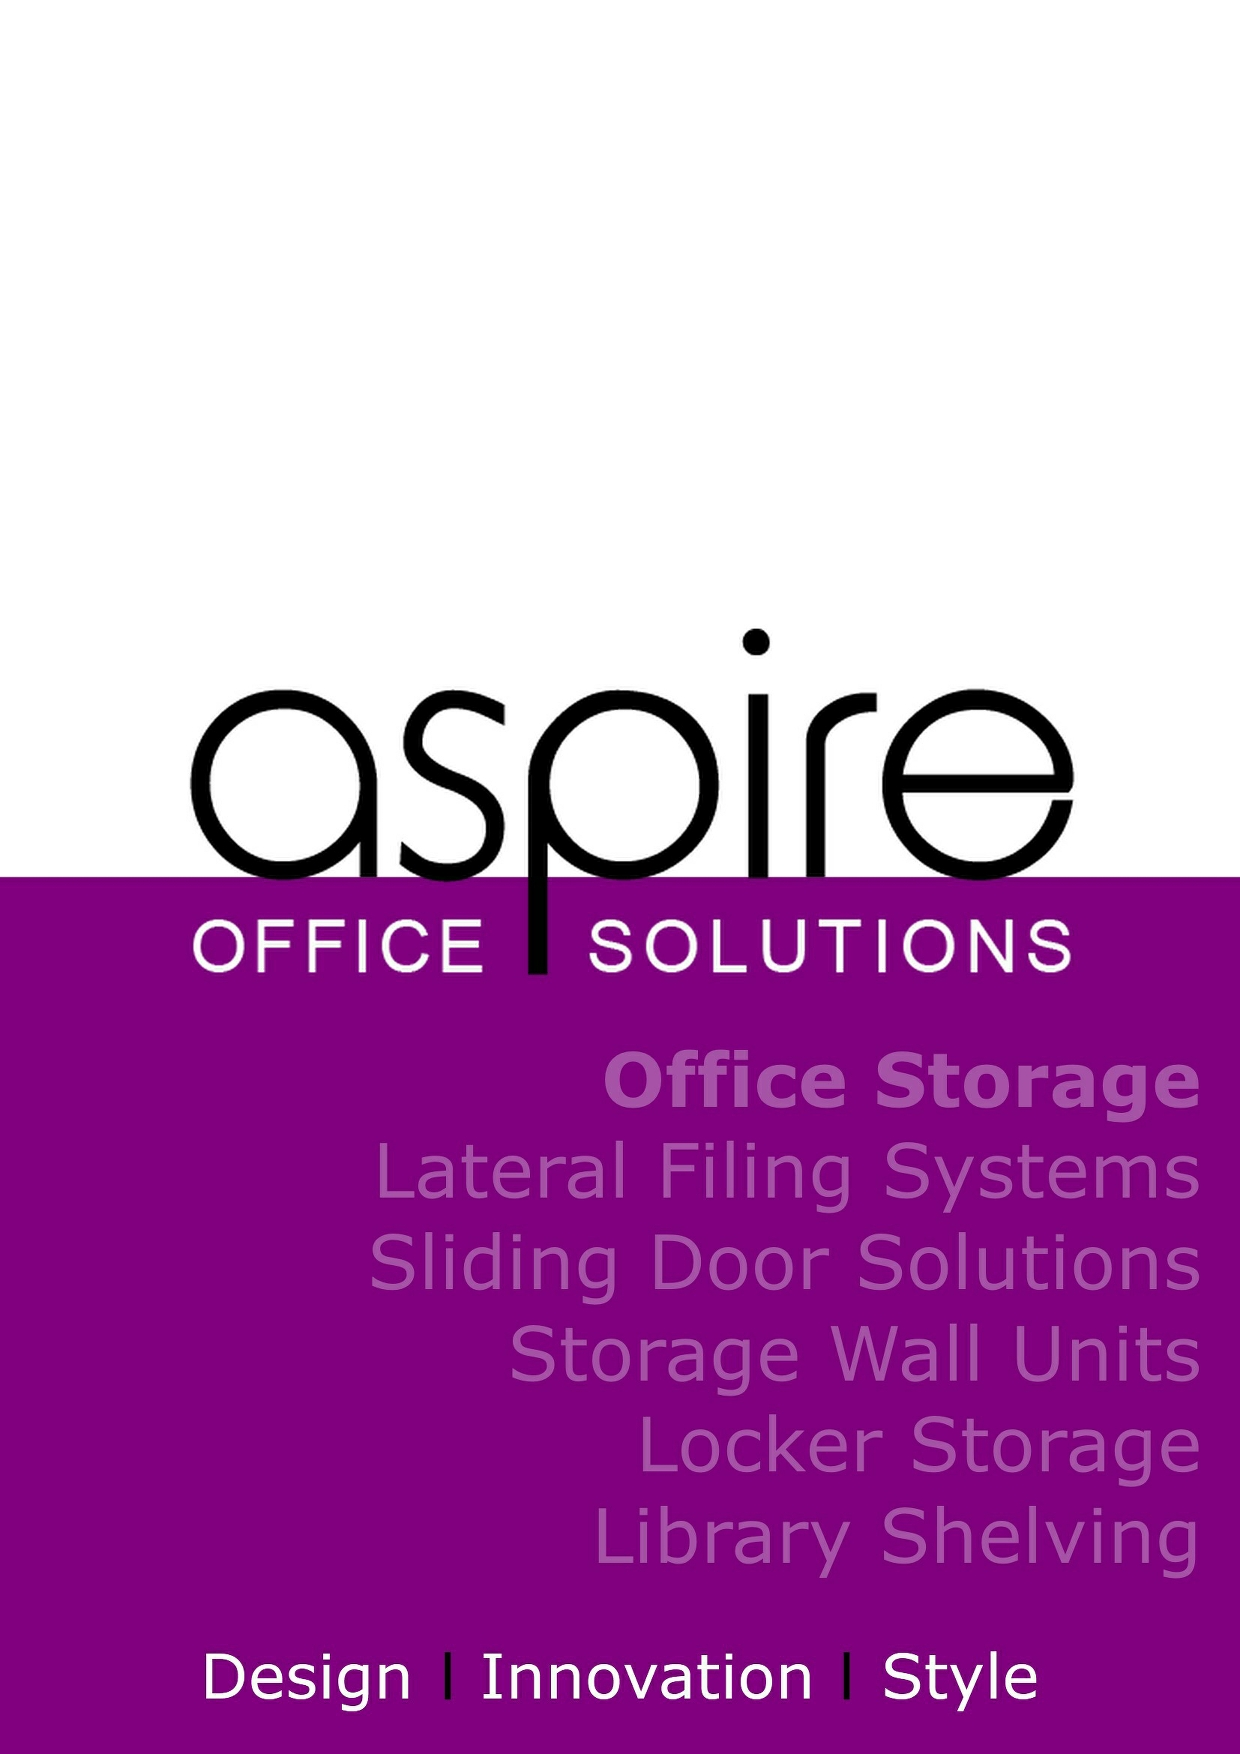 4_Aspire_Office_Solutions_-_Storage_Brochure